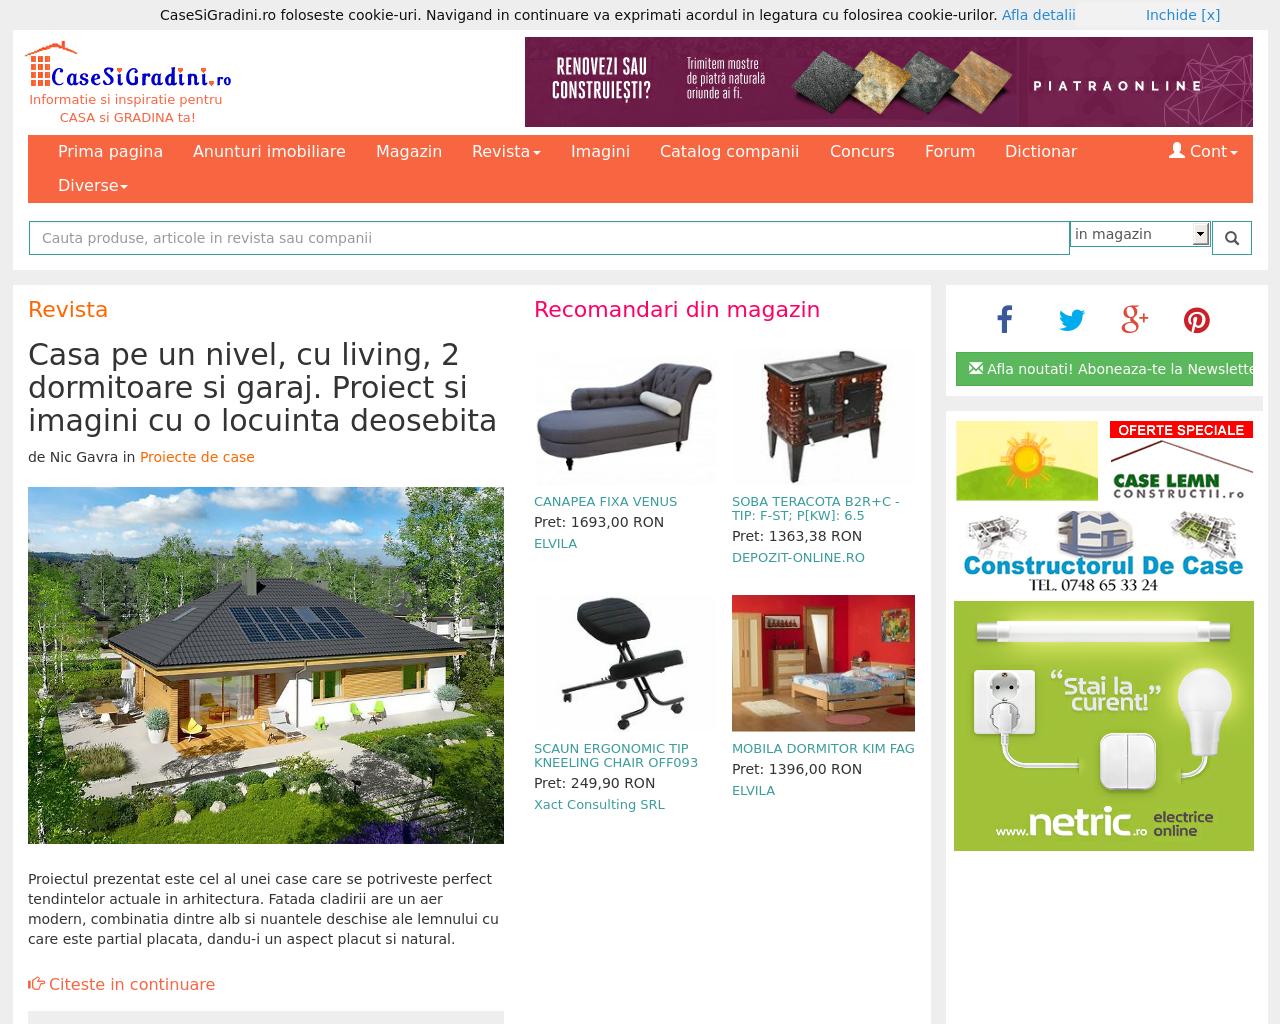 CaseSiGradini.ro-Advertising-Reviews-Pricing